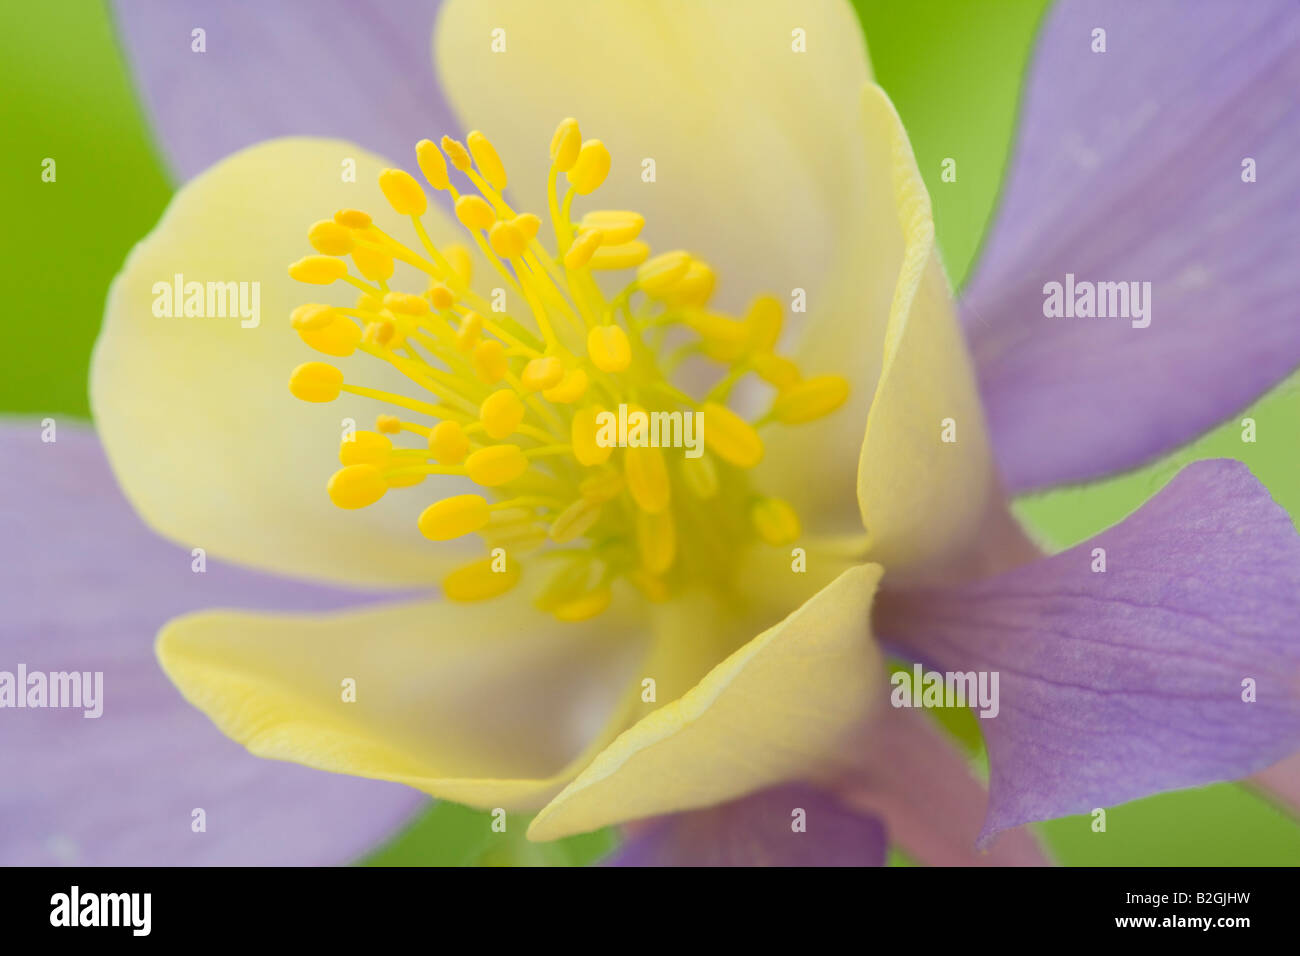 akelei aquilegia vulgaris columbine ancolie flower still stills background backgrounds patterns patterns close up - Stock Image